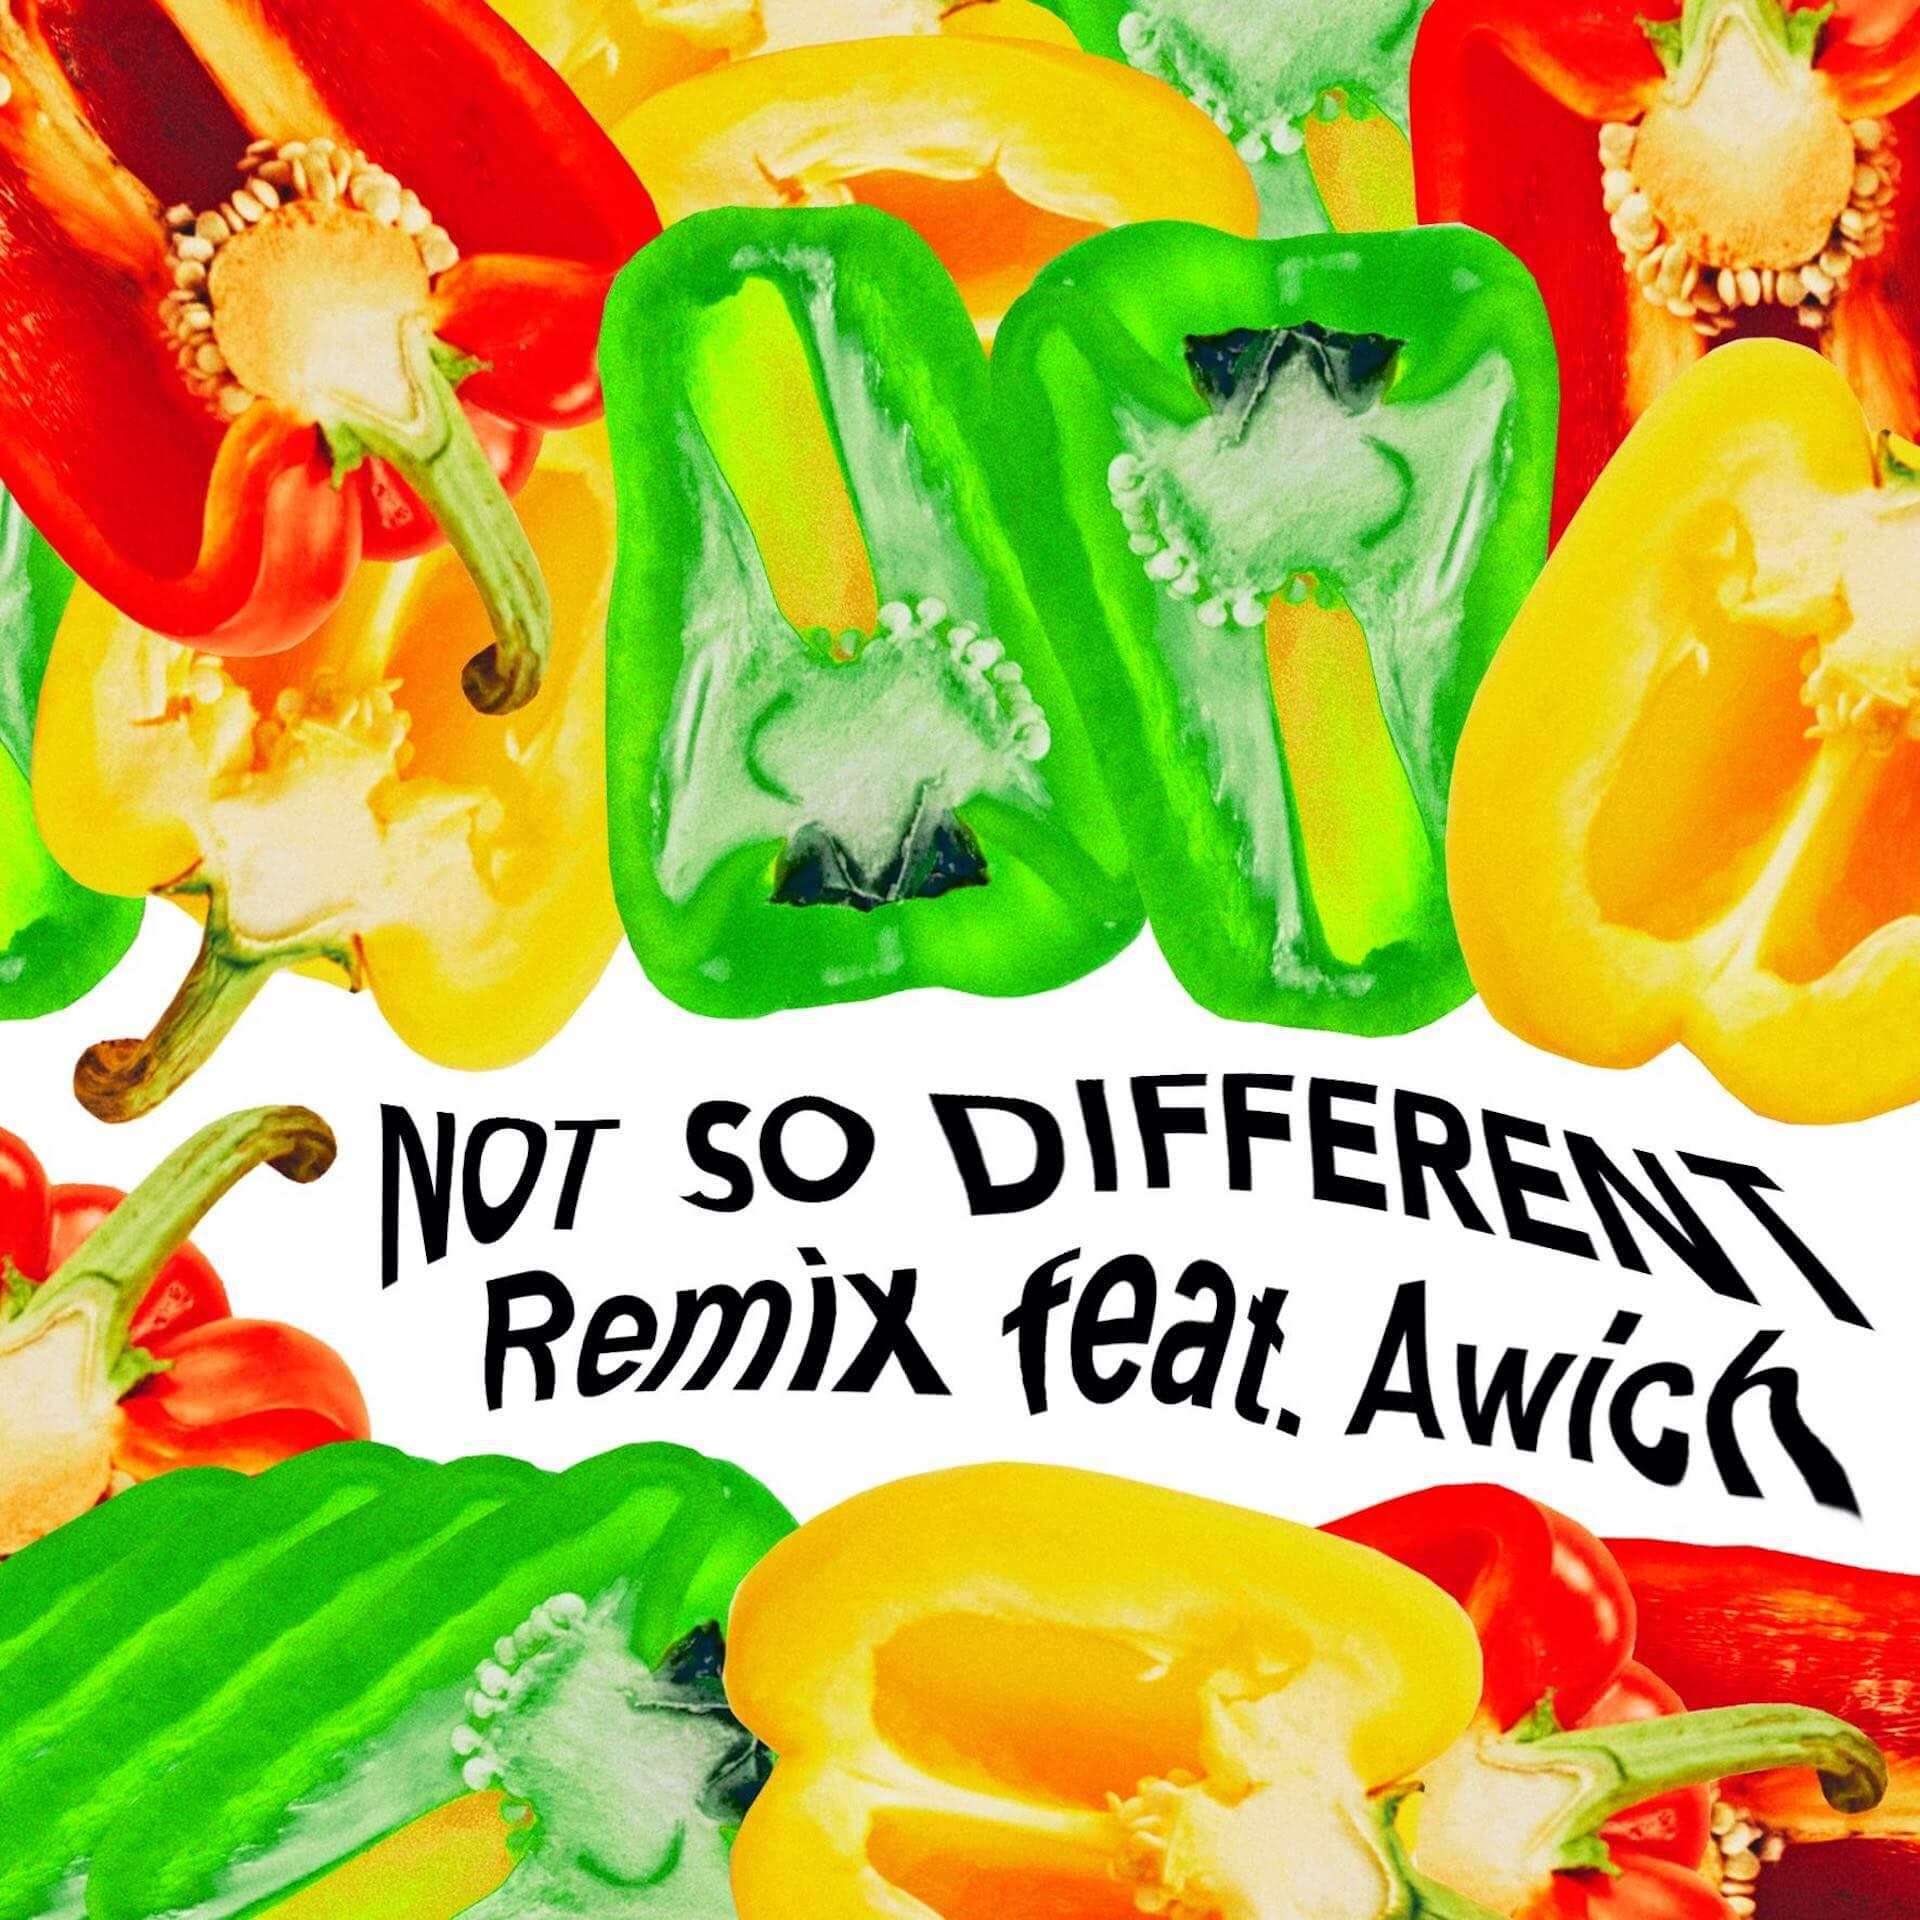 "Awichによる映画『サイレント・トーキョー』挿入歌""Present""が本日配信リリース!『ミュージックステーション2Hスペシャル』への出演も決定 music201204_awich_1"